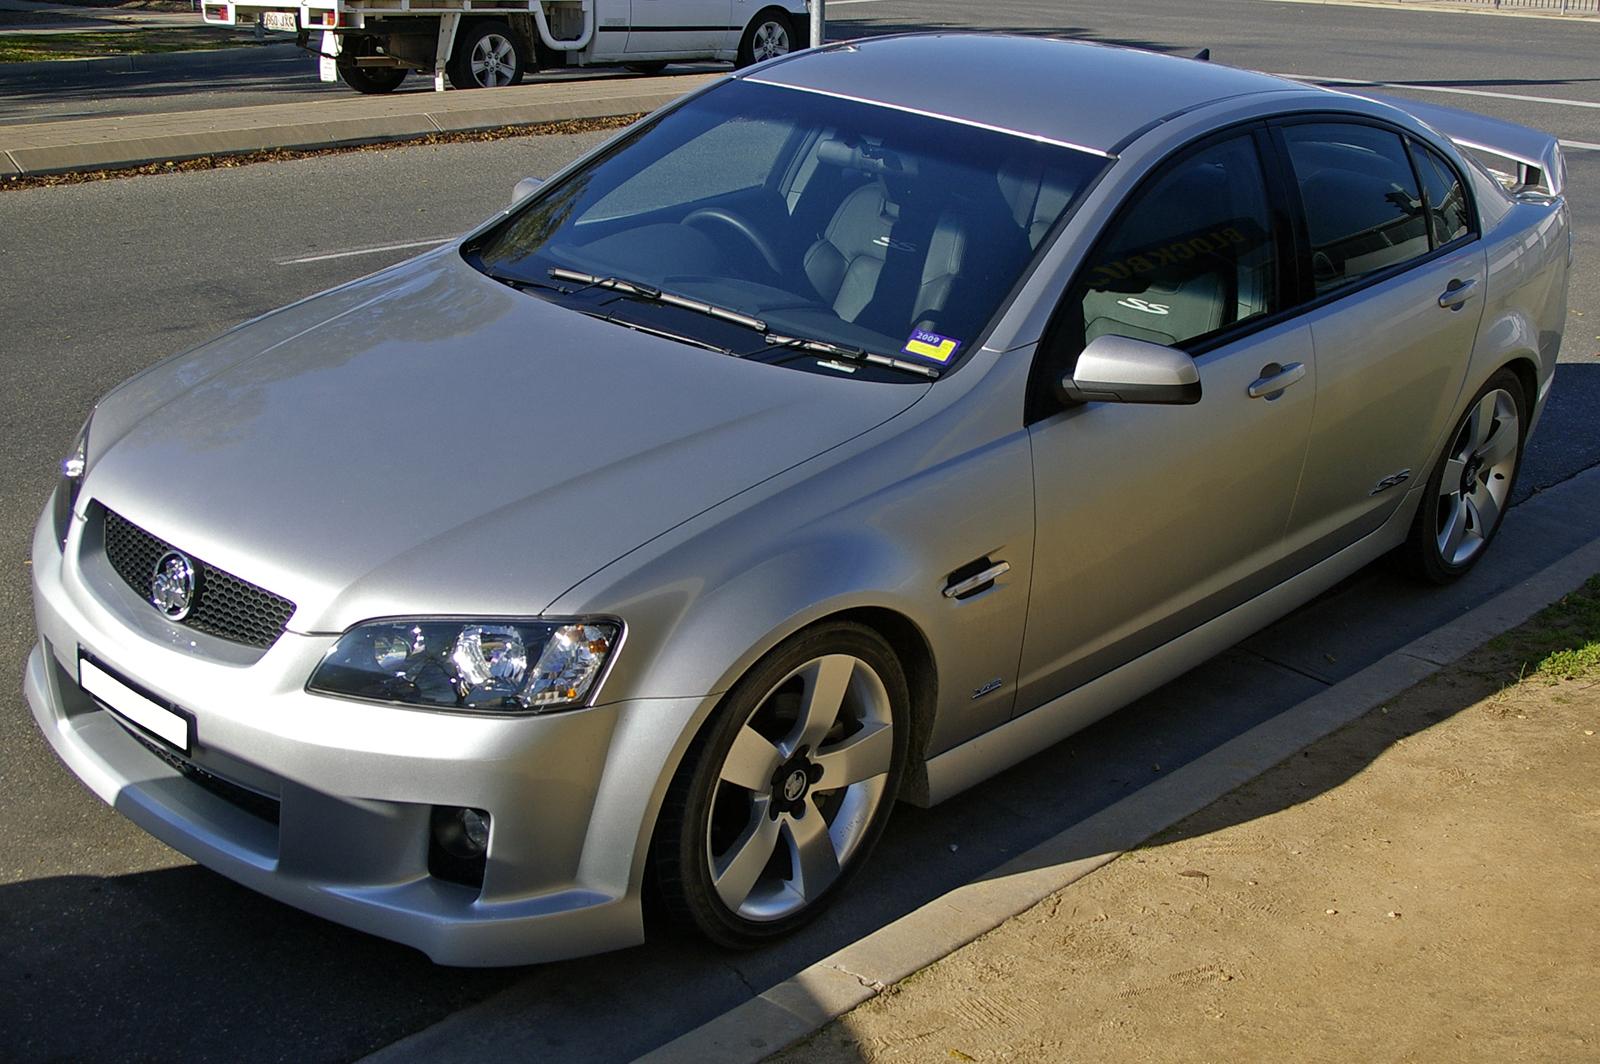 Tint A Car Ipswich Reviews